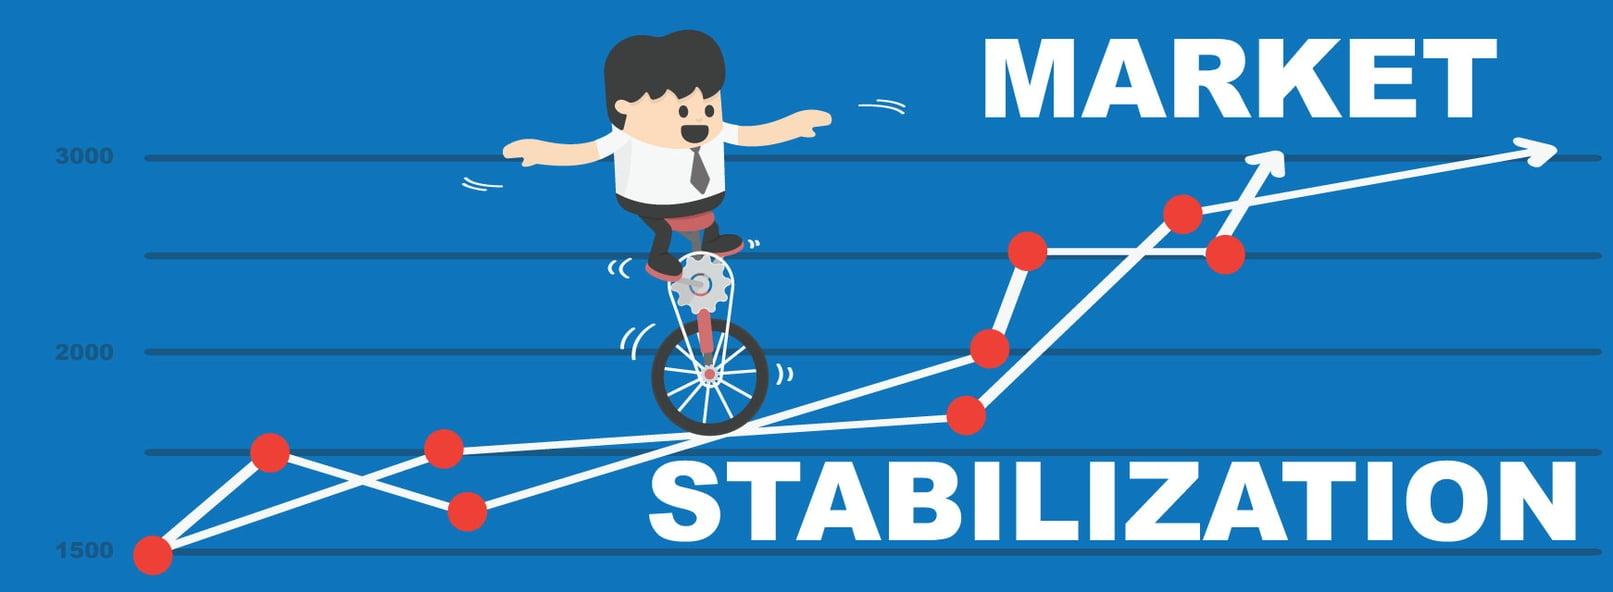 market-stabilization.jpg